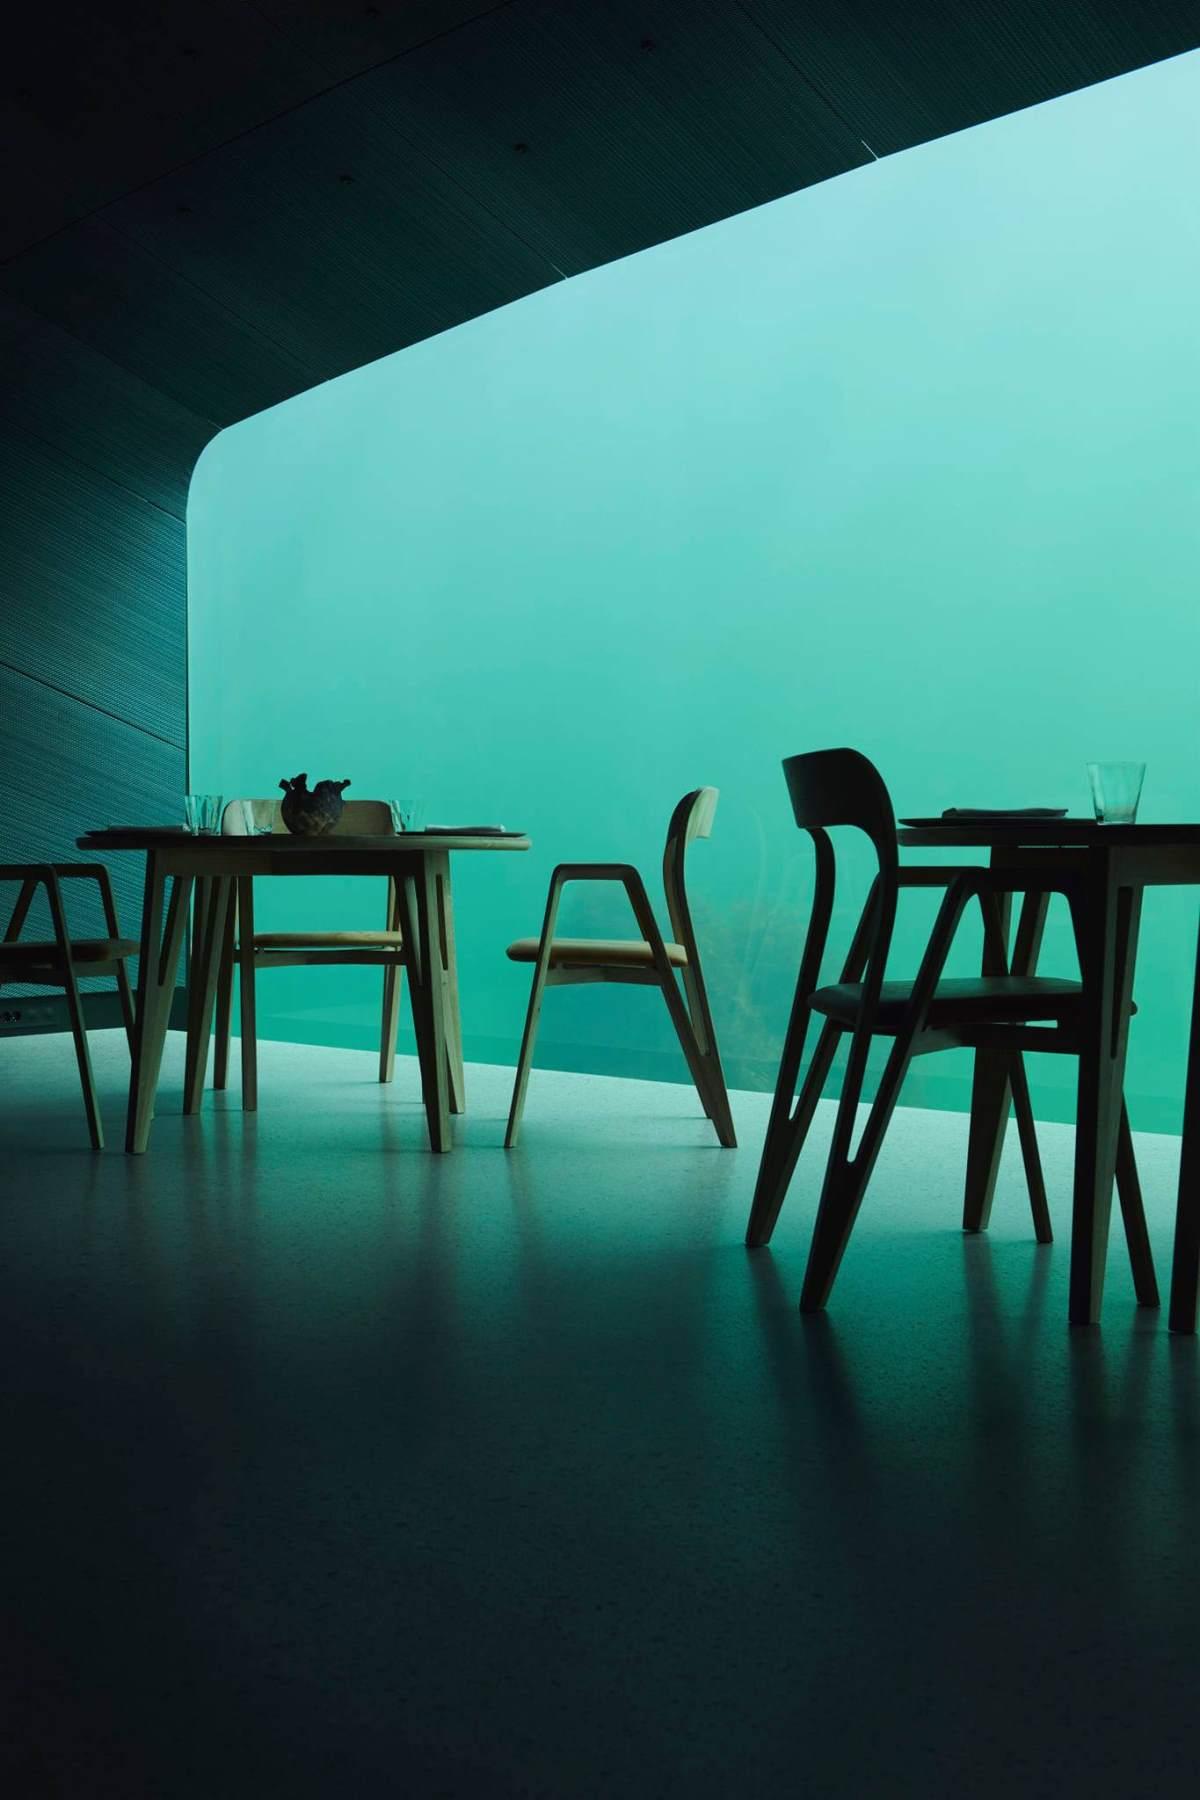 Under, Νορβηγία  το πιο Instagrammable εστιατόριο στον κόσμο, δίπλα στη τζαμαρία